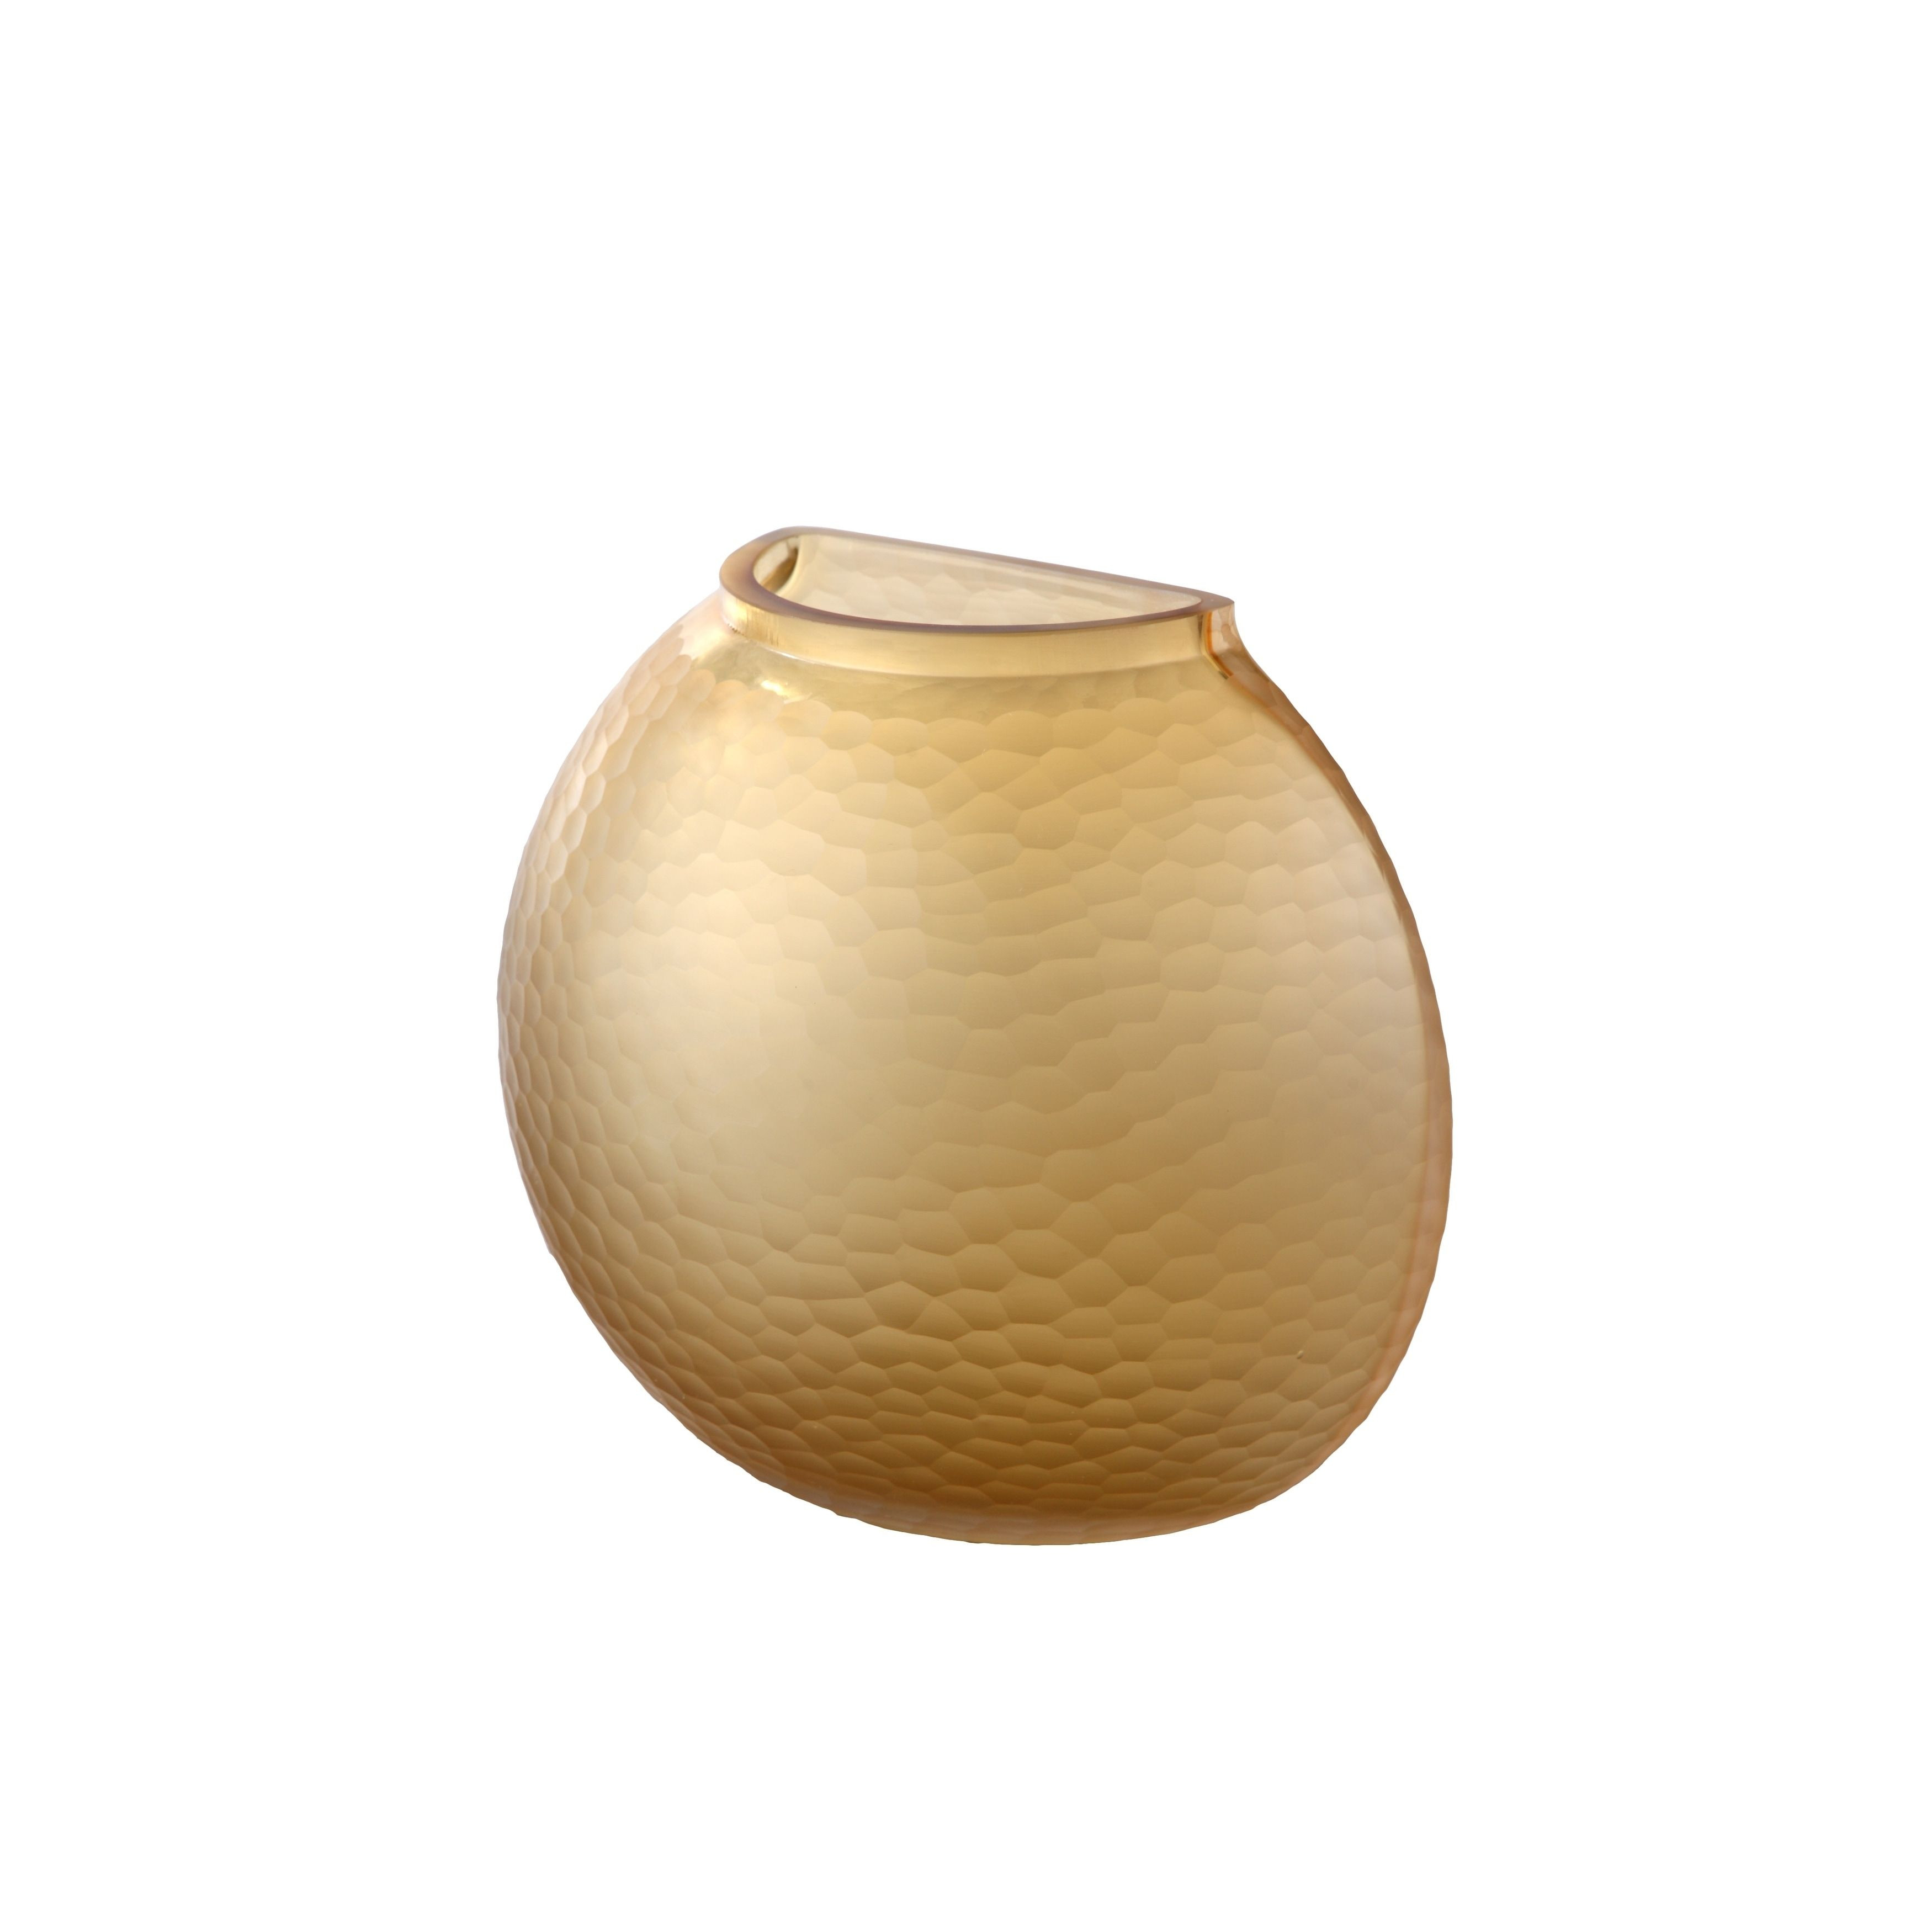 purple glass vase fillers of aurelle home form glass vase blue size medium 8 15 medium 8 intended for aurelle home form glass vase orange size medium 8 15